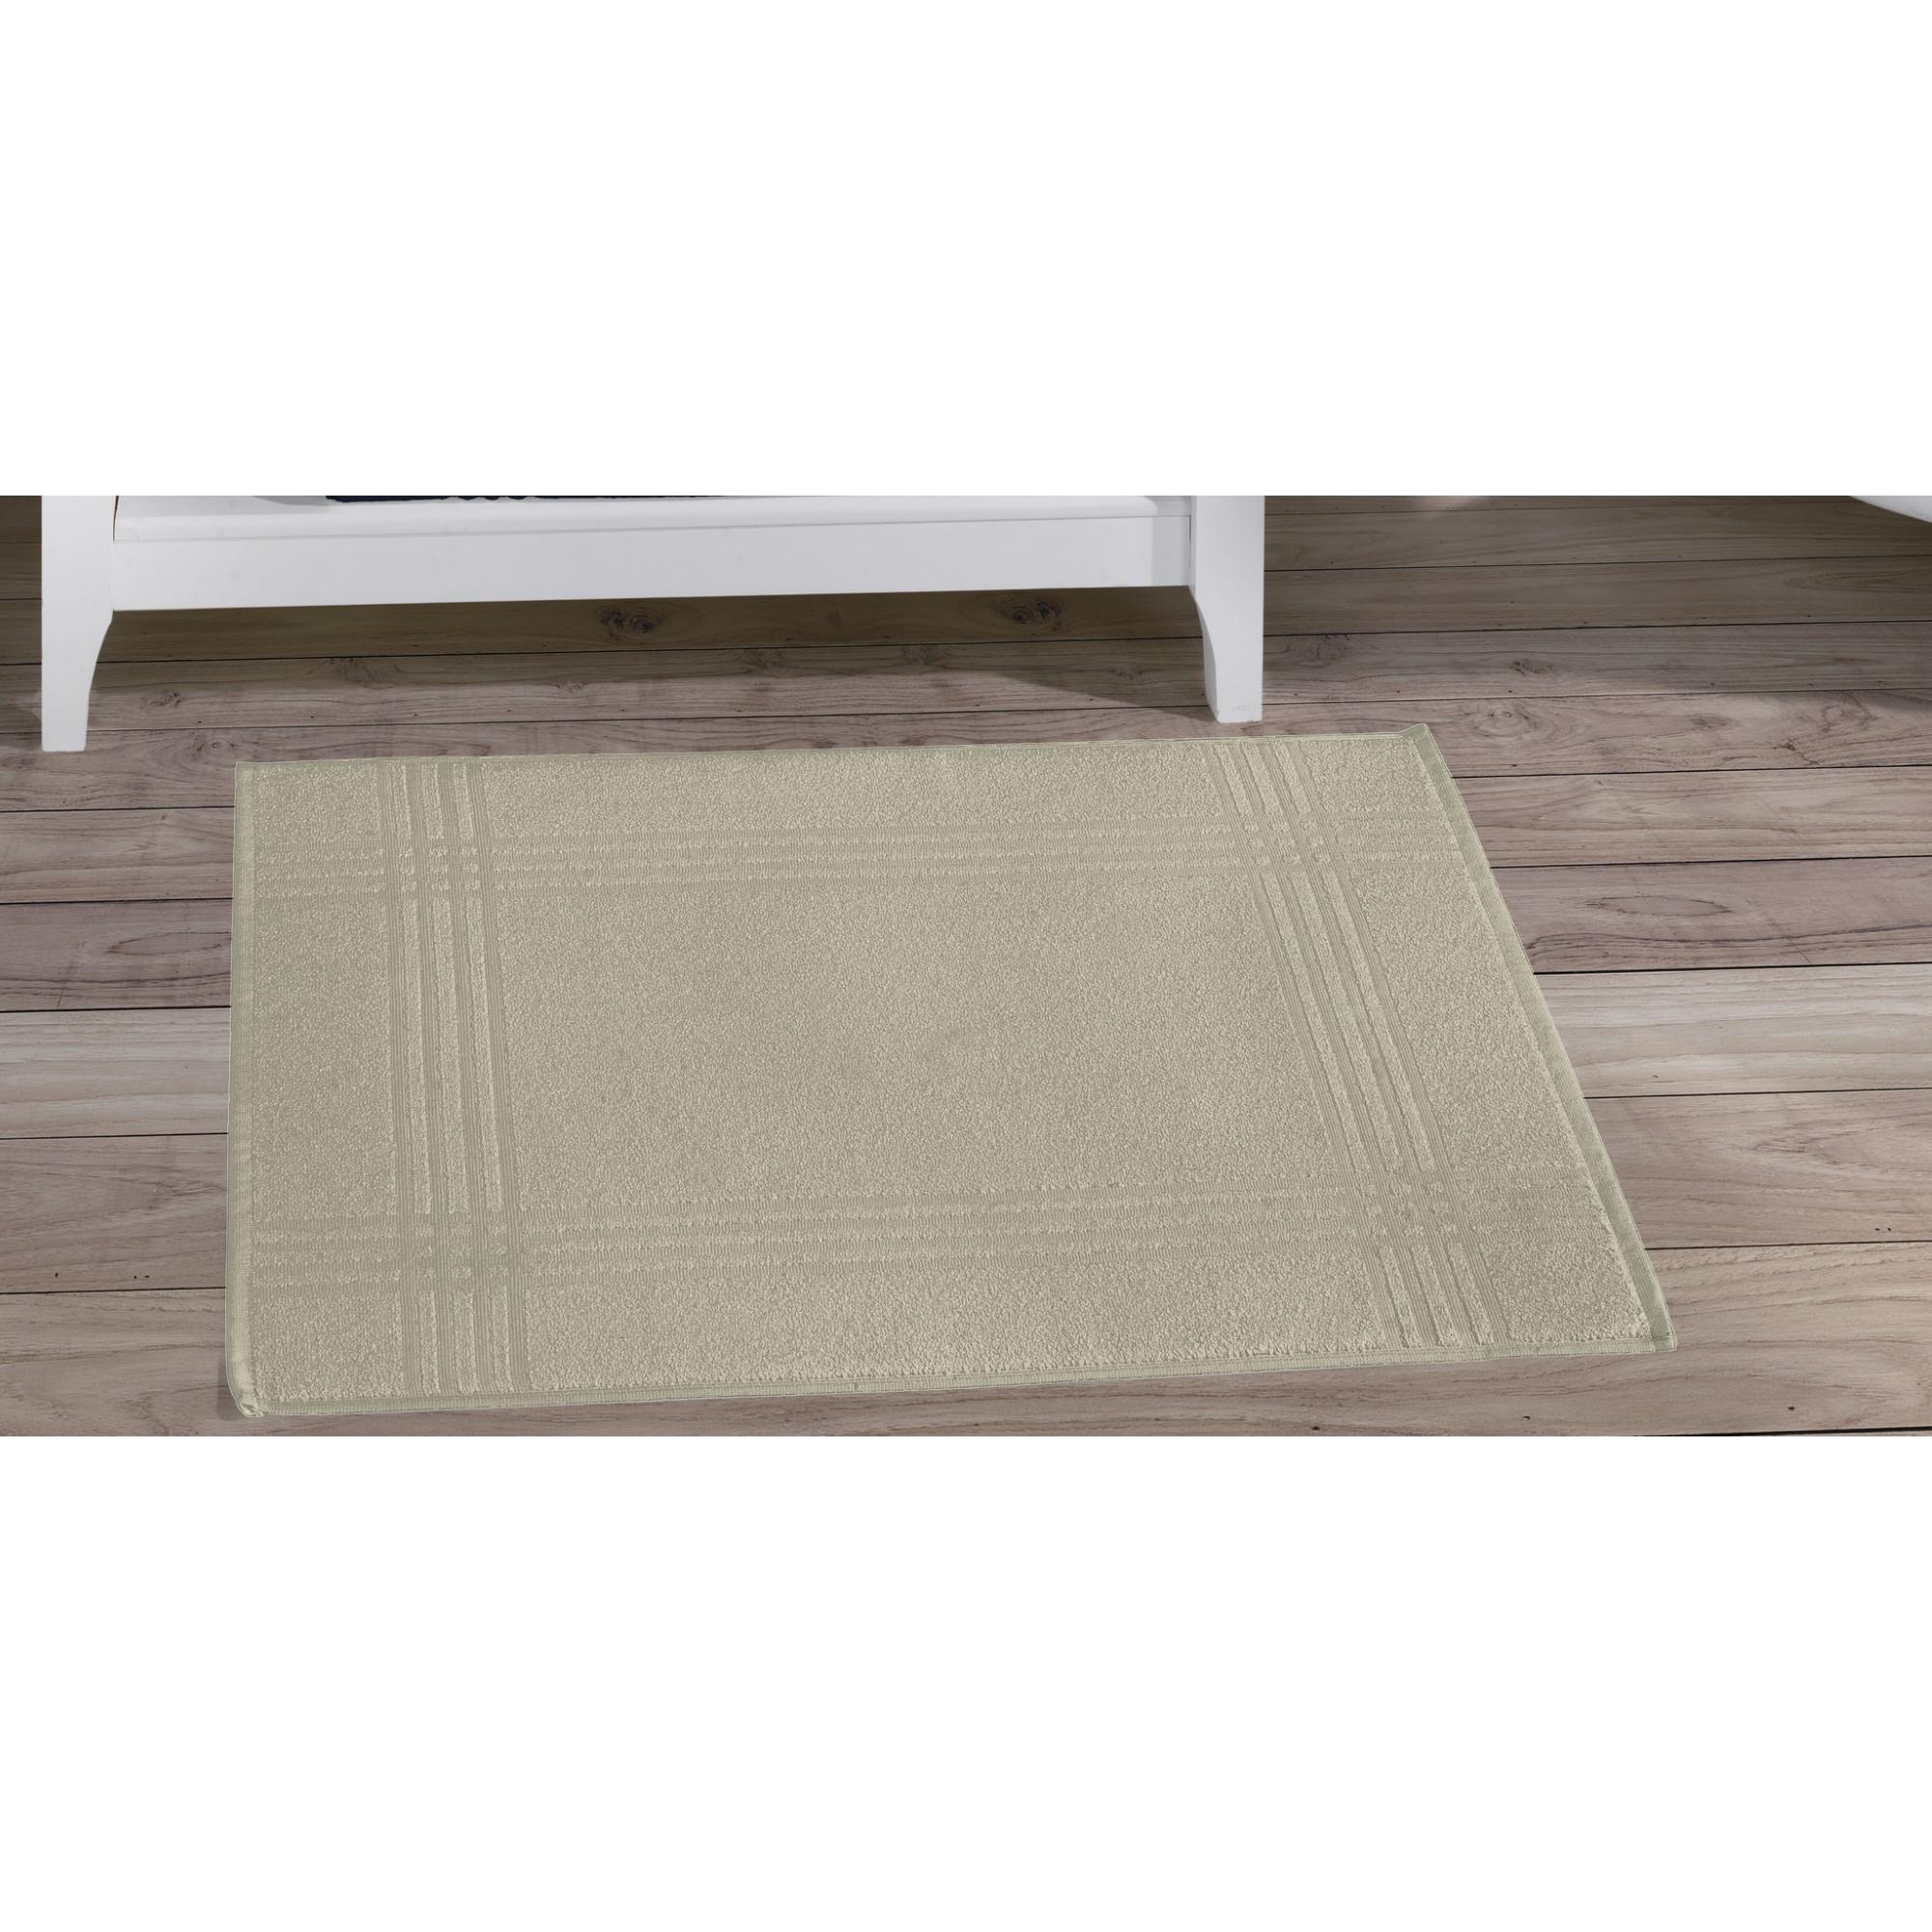 Toalha de Piso Tramas 50 x 70 cm 100 algodao Palha - Buettner